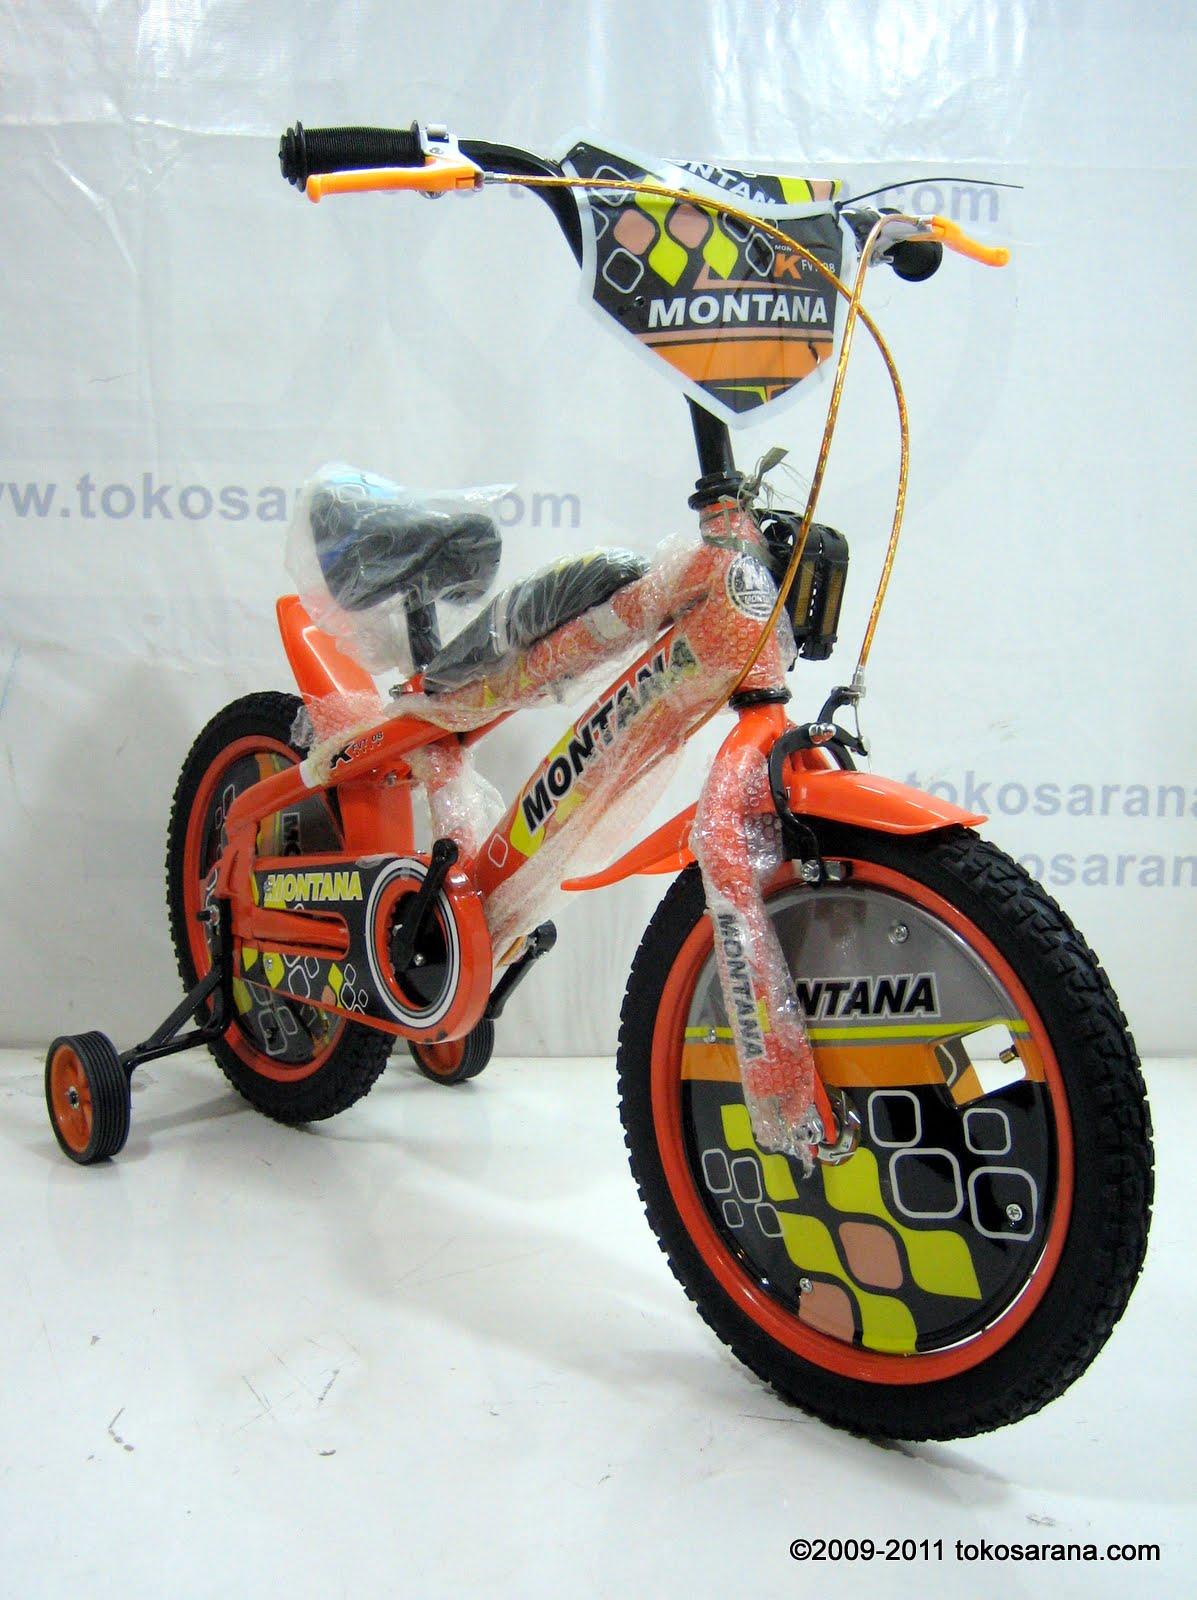 Tokomagenta A Showcase Of Products Sepeda Anak Montana